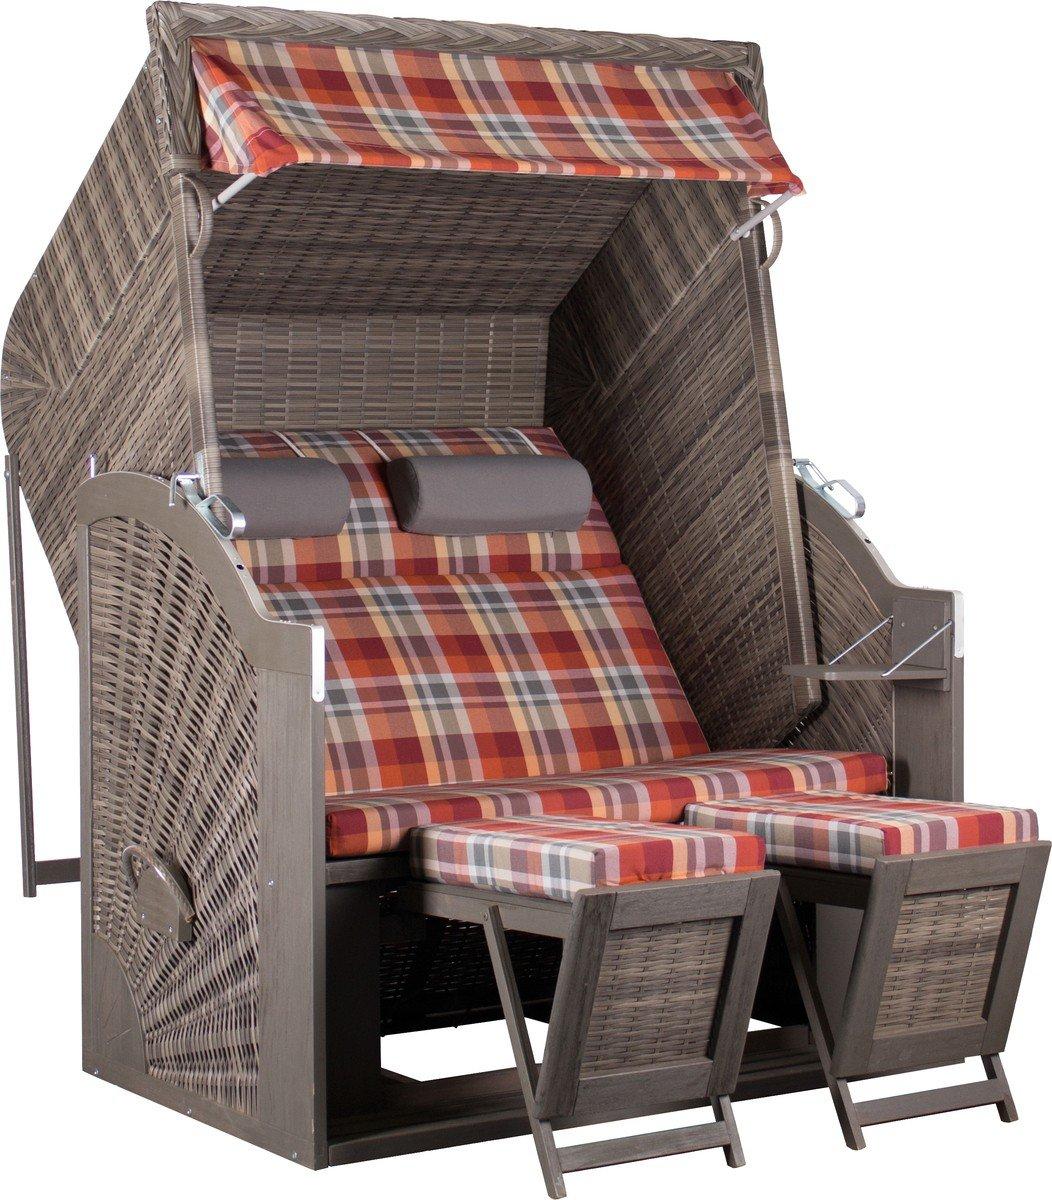 STRANDK.PURE Strandkorb ,,Trendy Pure® Classic XL' Dessin 429 Cla S.sun Xl jetzt kaufen